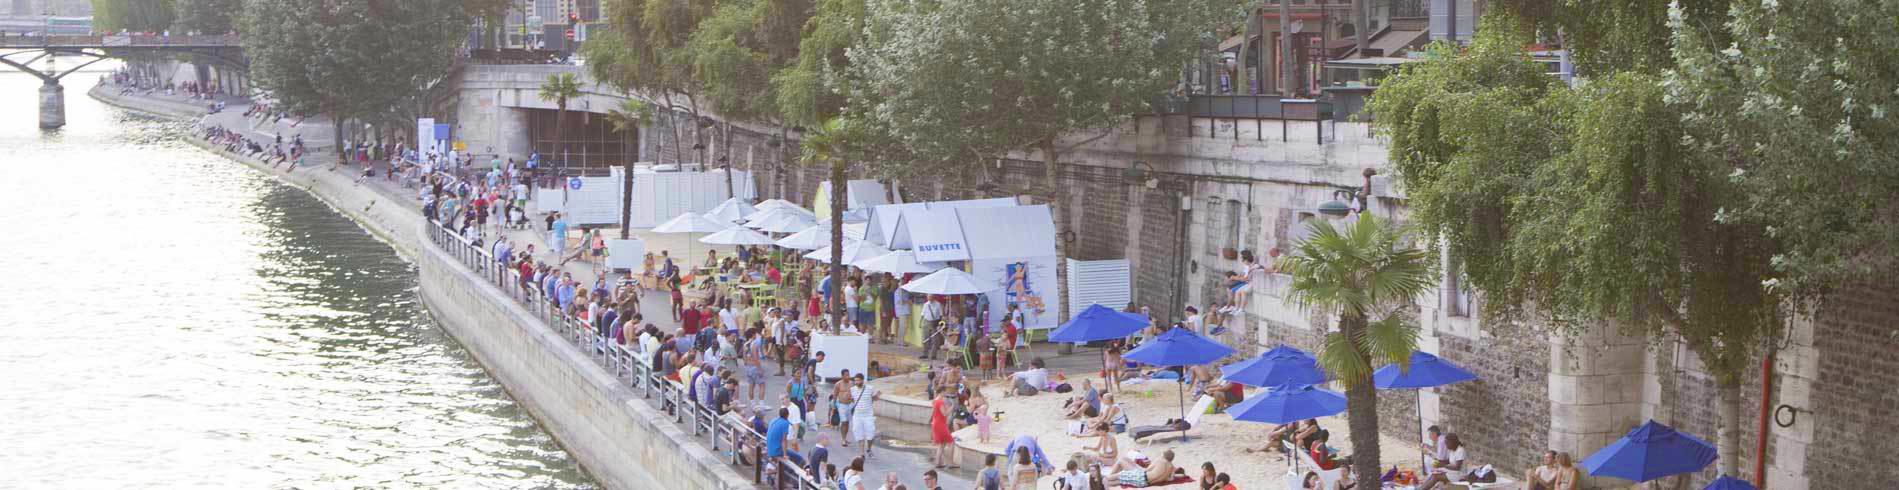 The bank of the Seine beach festival